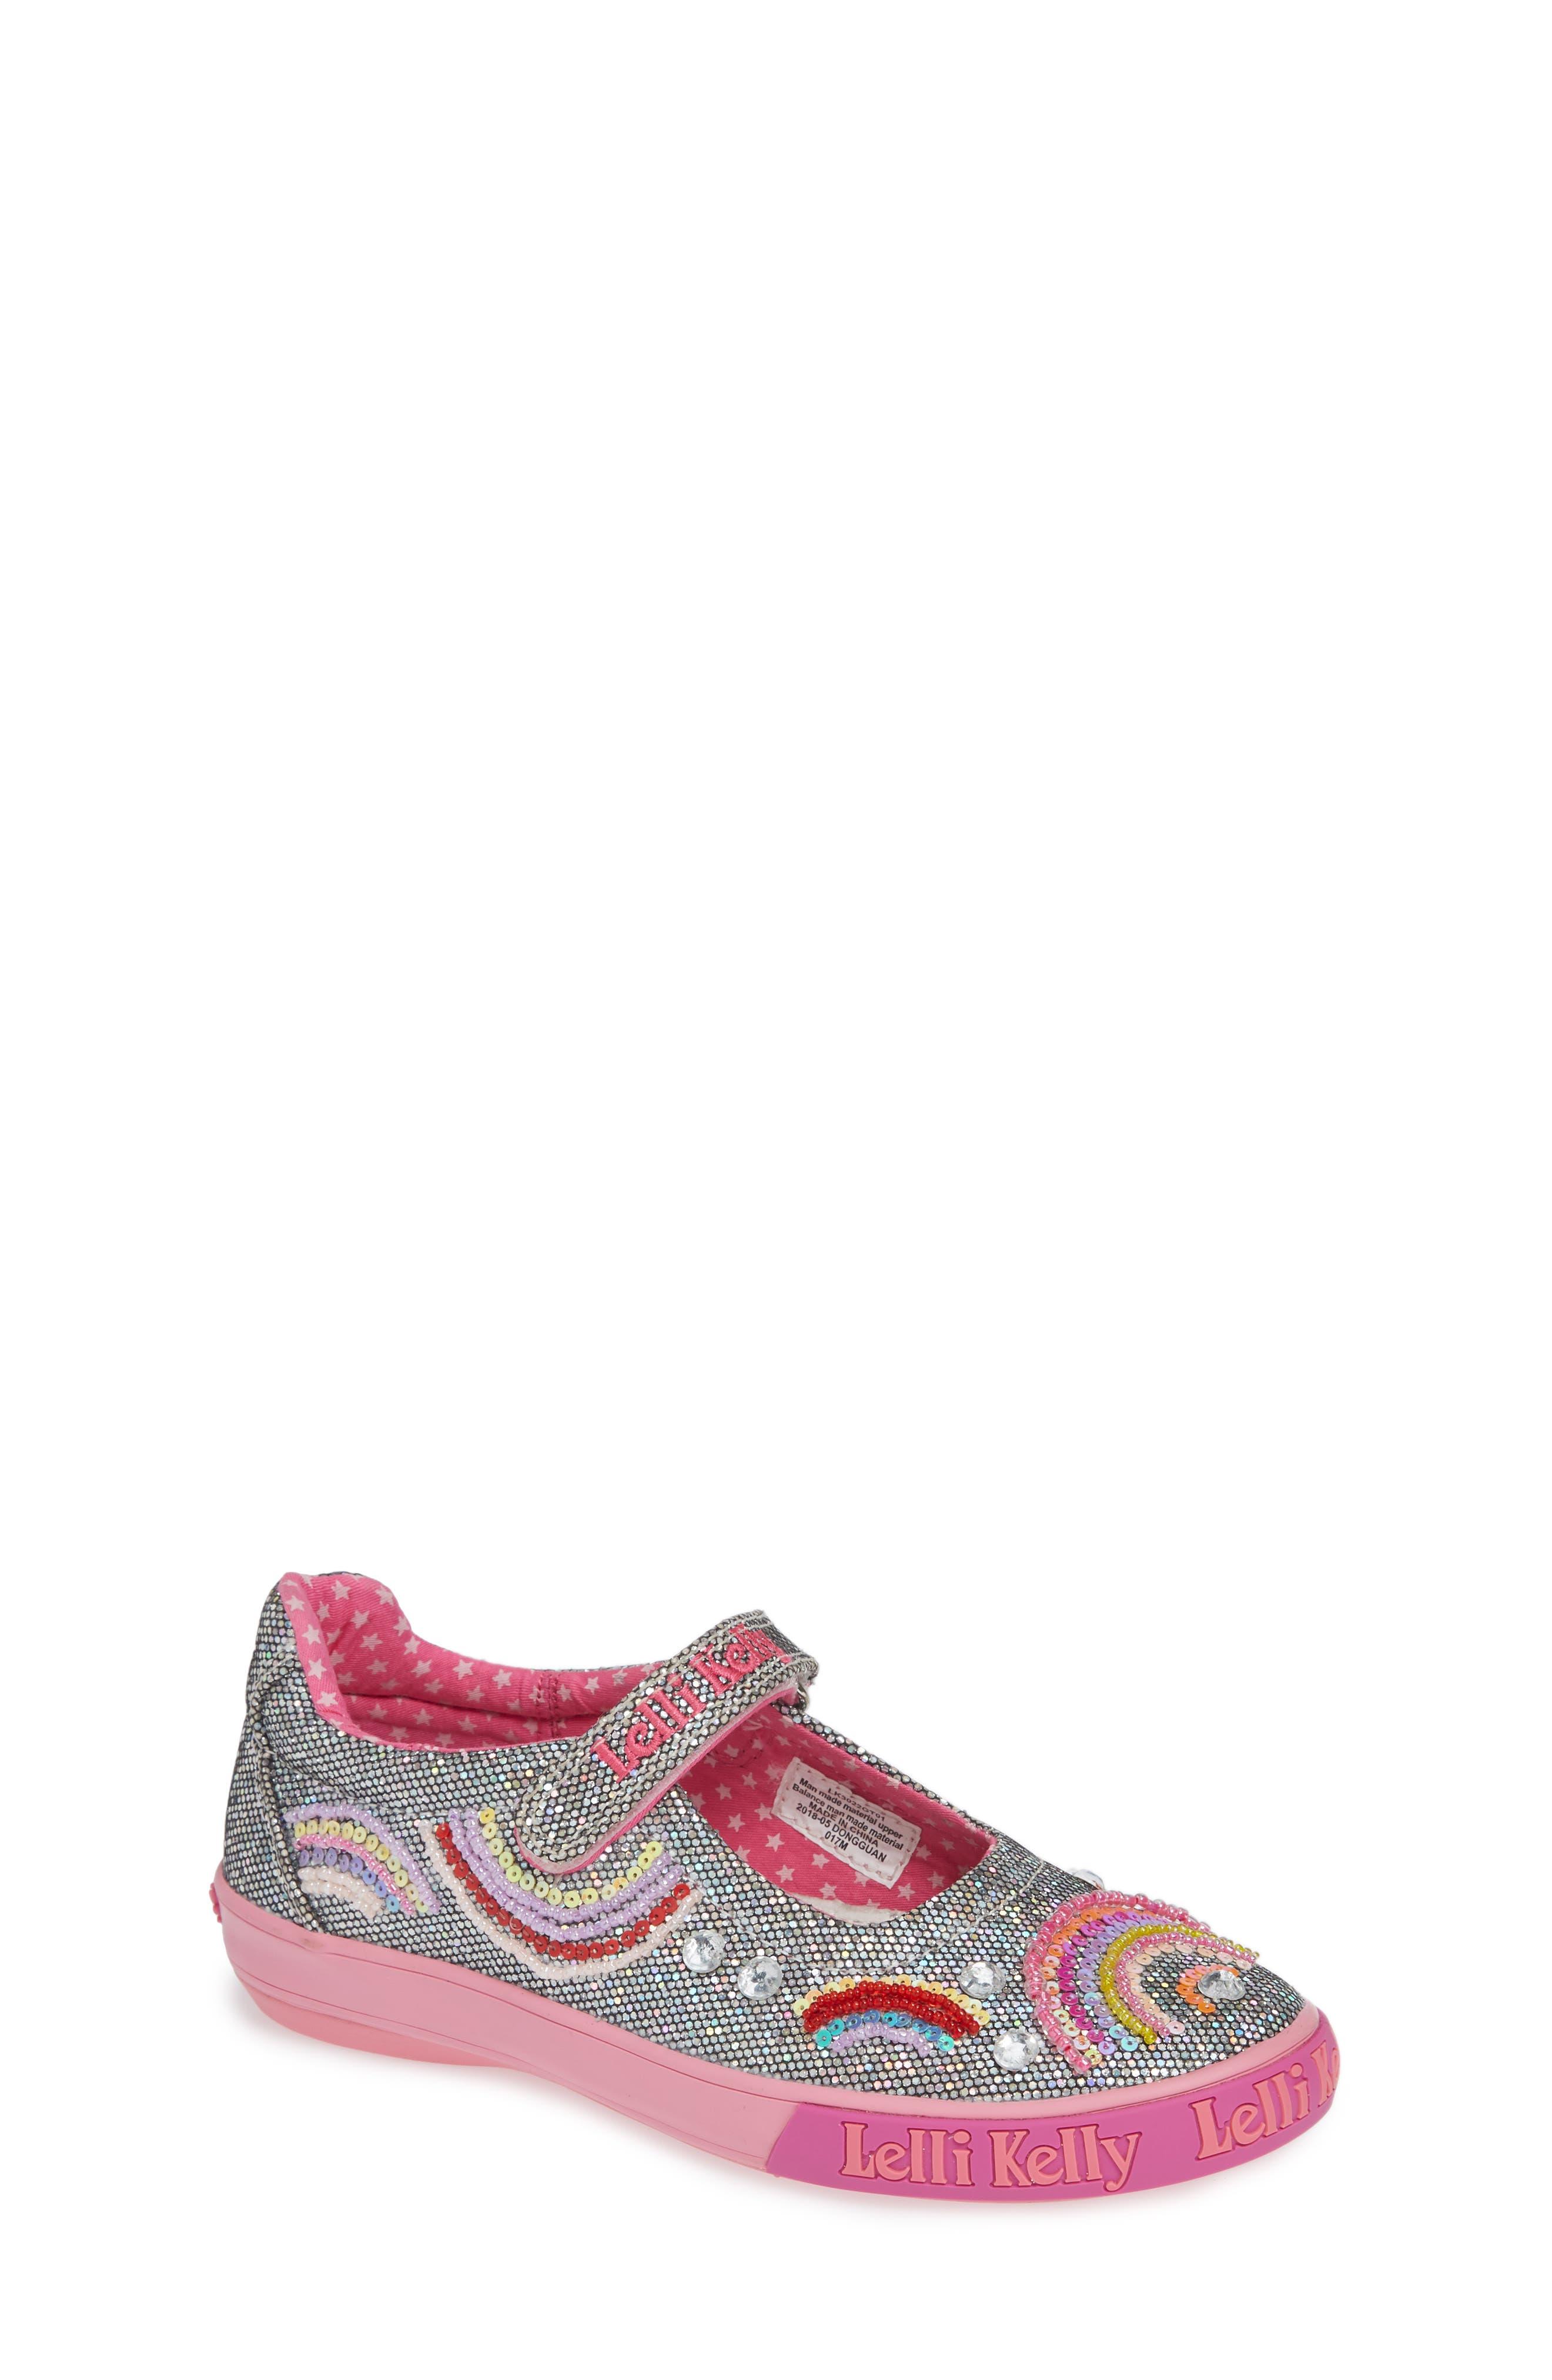 LELLI KELLY Beaded Rainbow Mary Jane Sneaker, Main, color, PEWTER